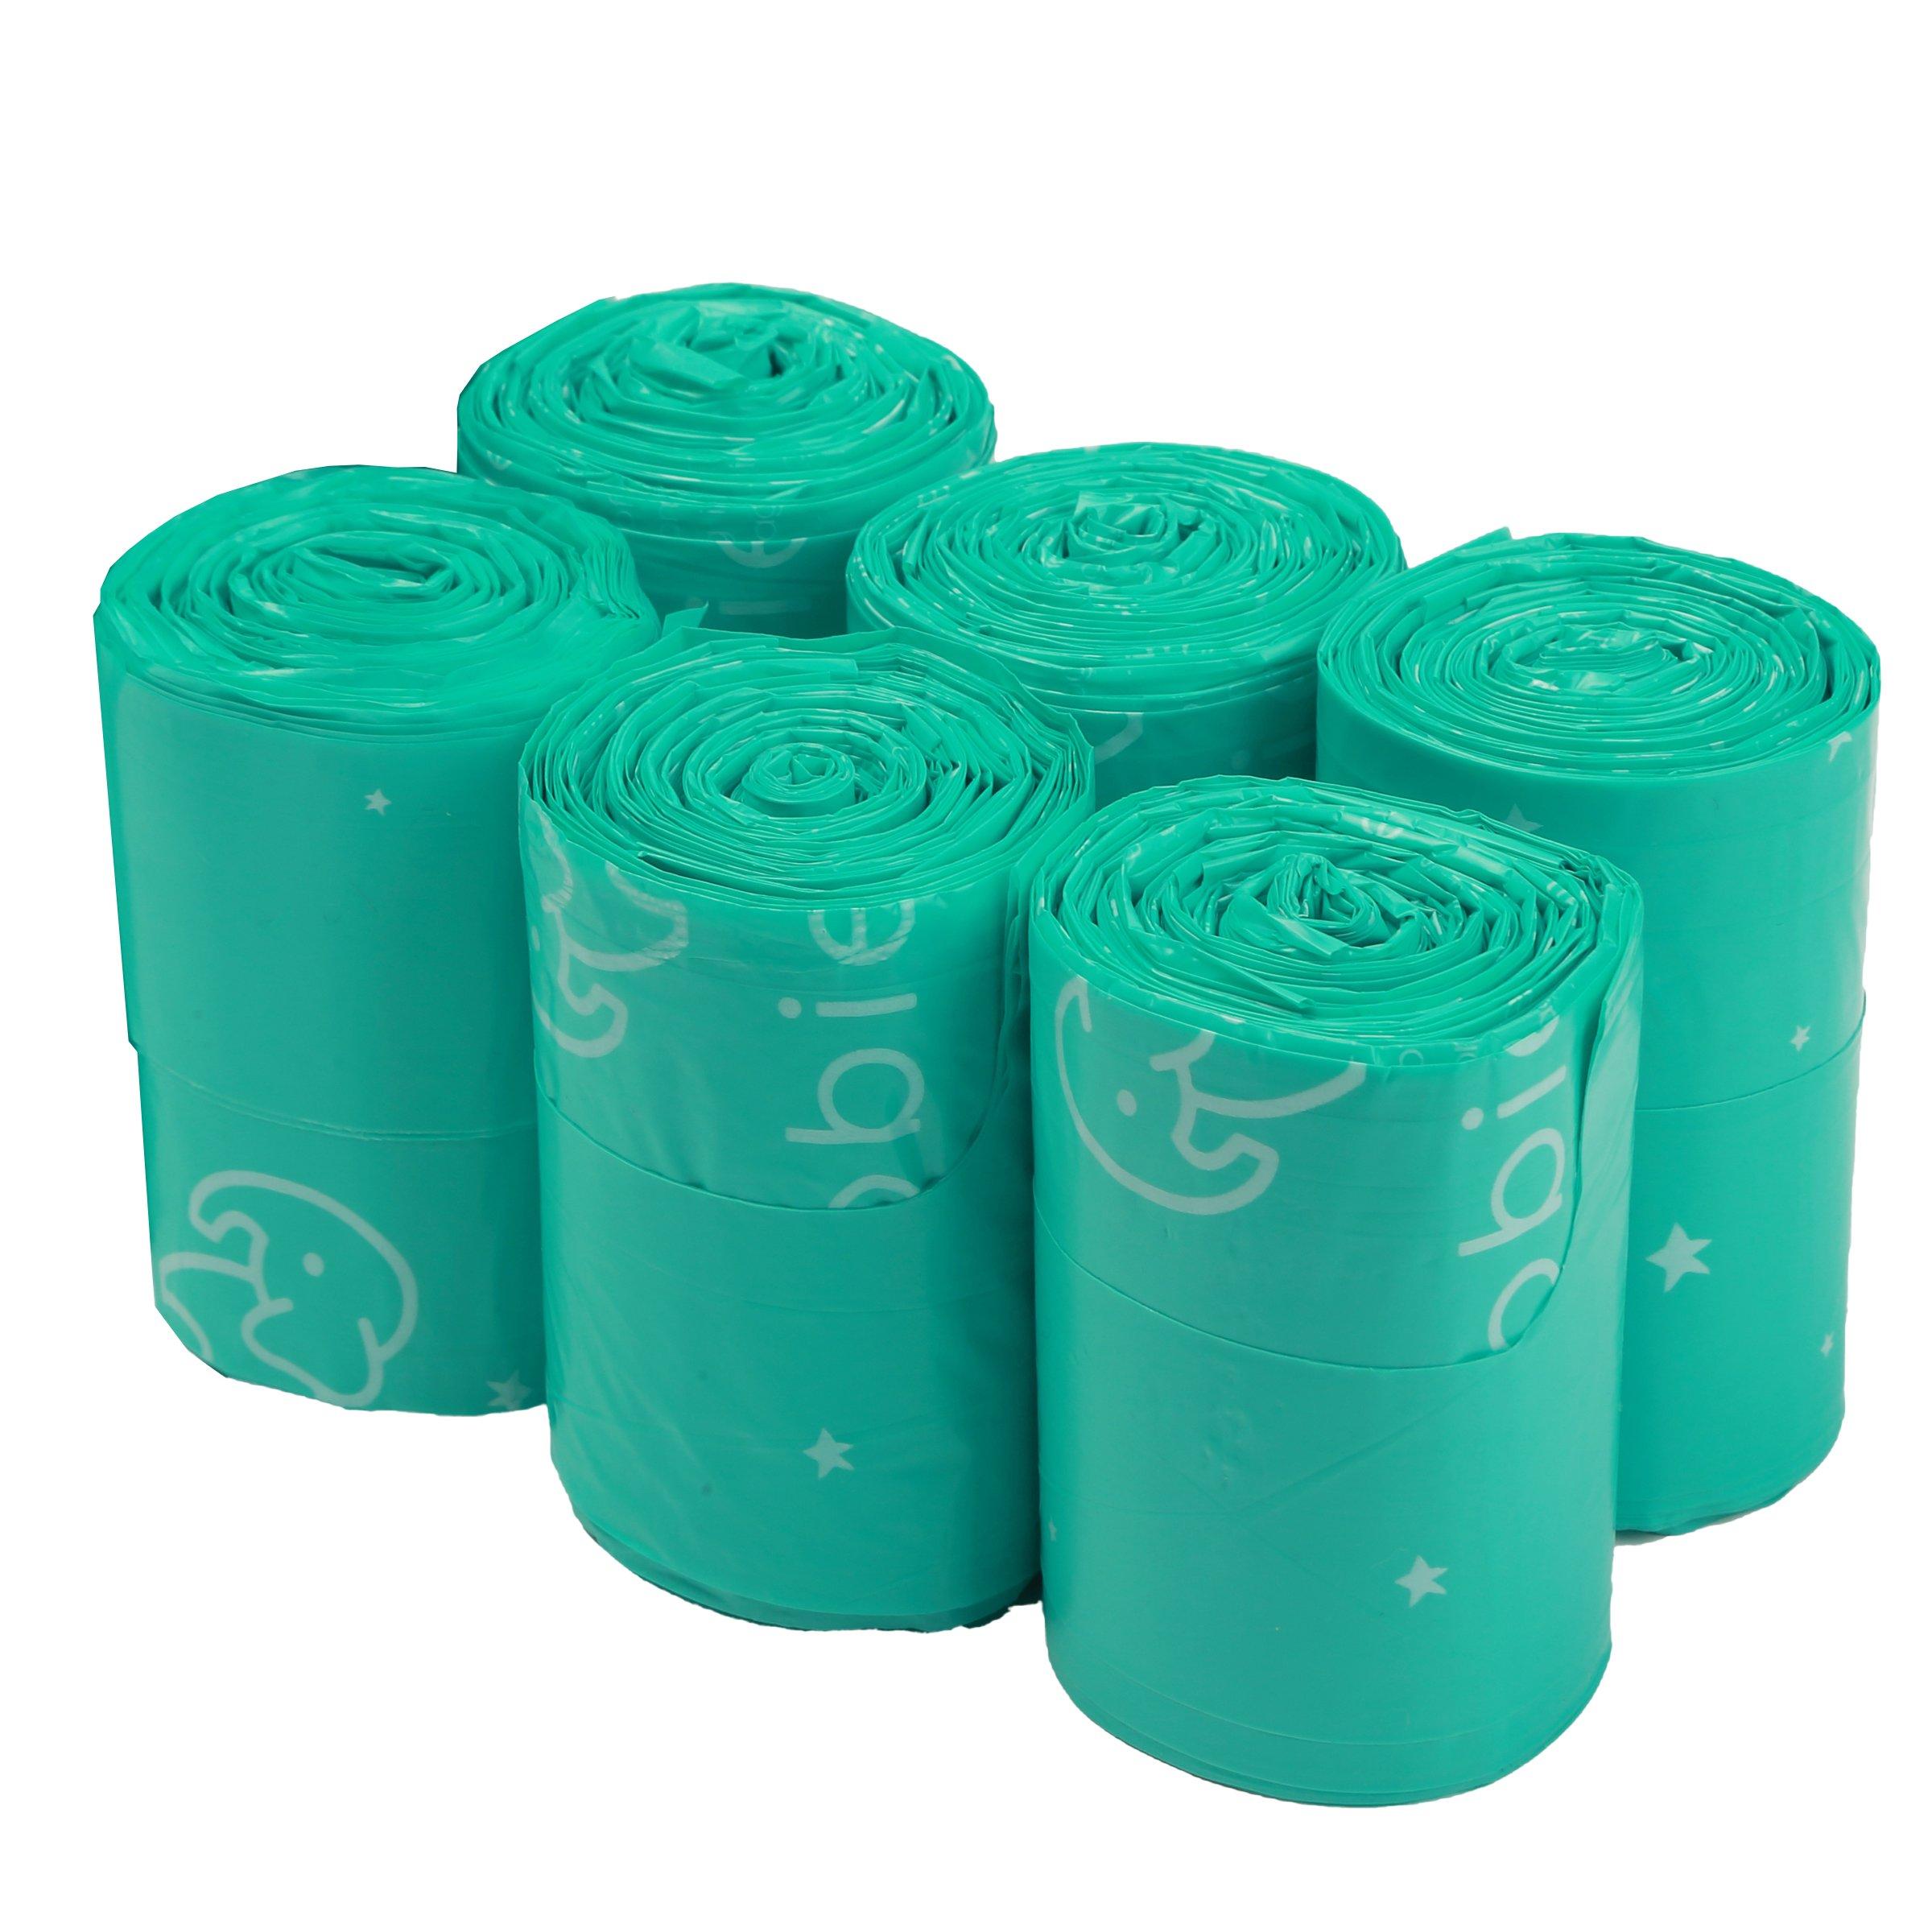 Goobie Baby Diaper Bag Dispenser Refill Rolls of Unscented Disposable Refill Bags | Waste Bag (6 Roll Bag Refill - 150 Bags) by Goobie Baby